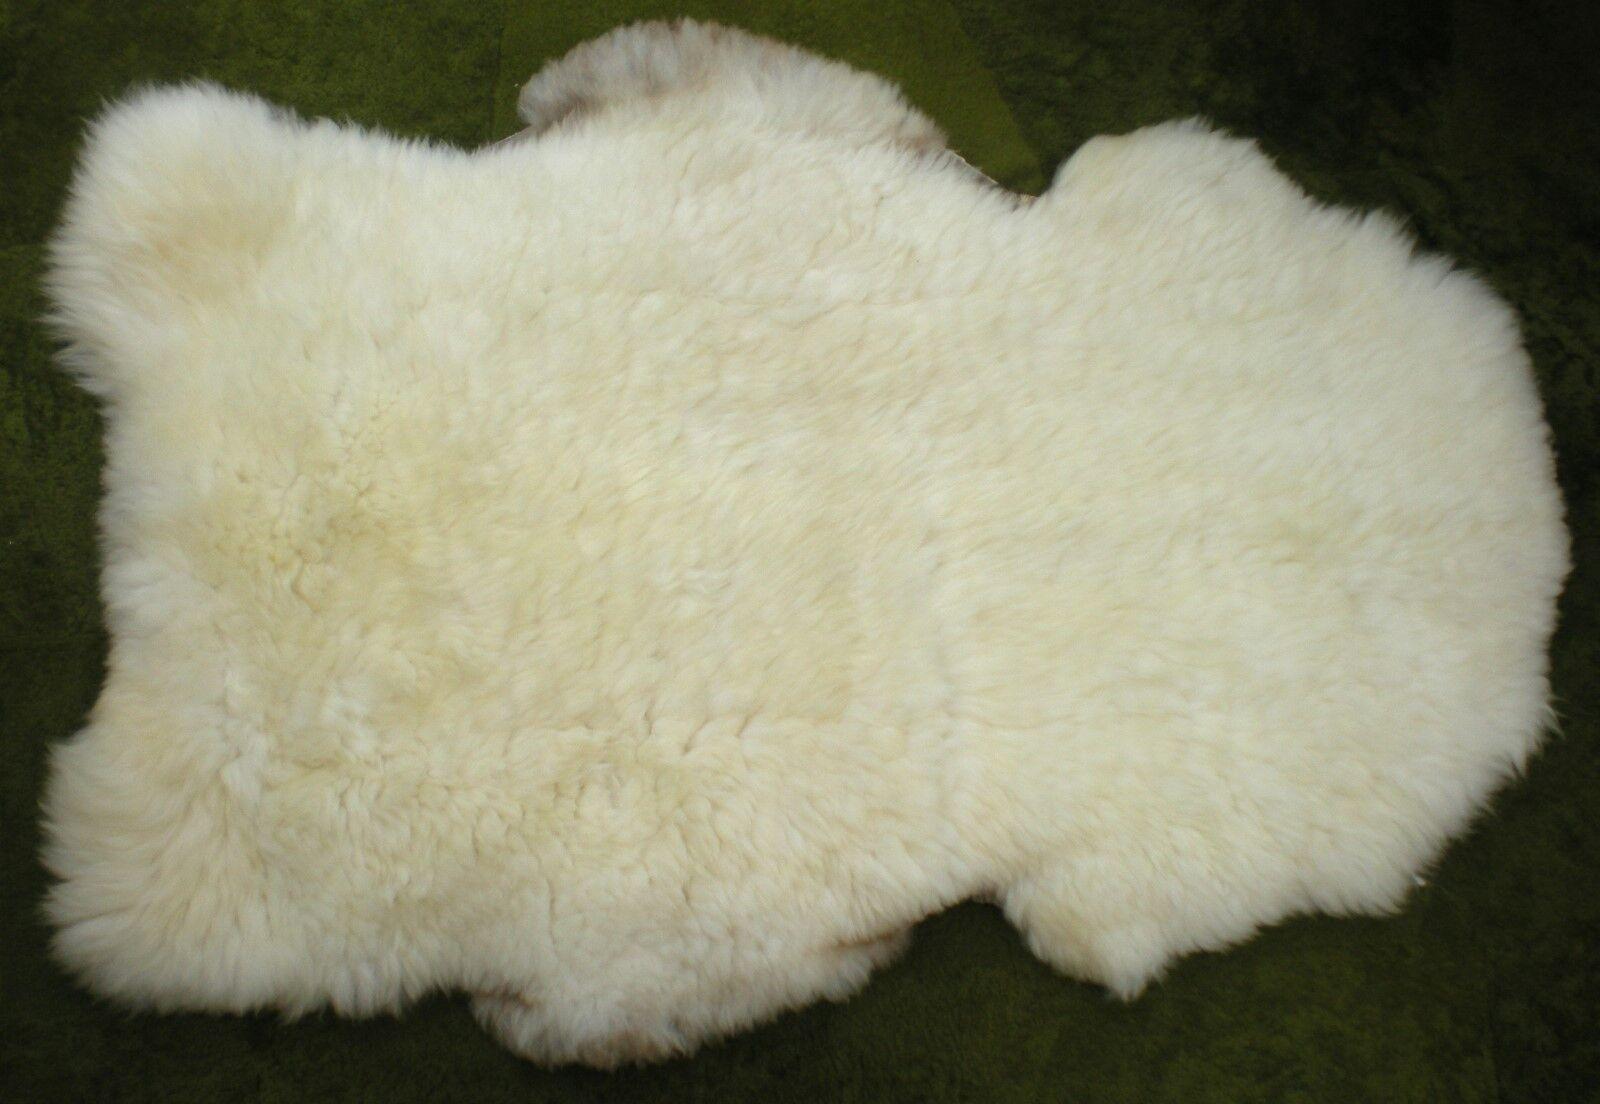 XXL 100% GENUINE NATURAL RUSTIC RARE BREED SHEEPSKIN RUG Ivory   Cream   RX02